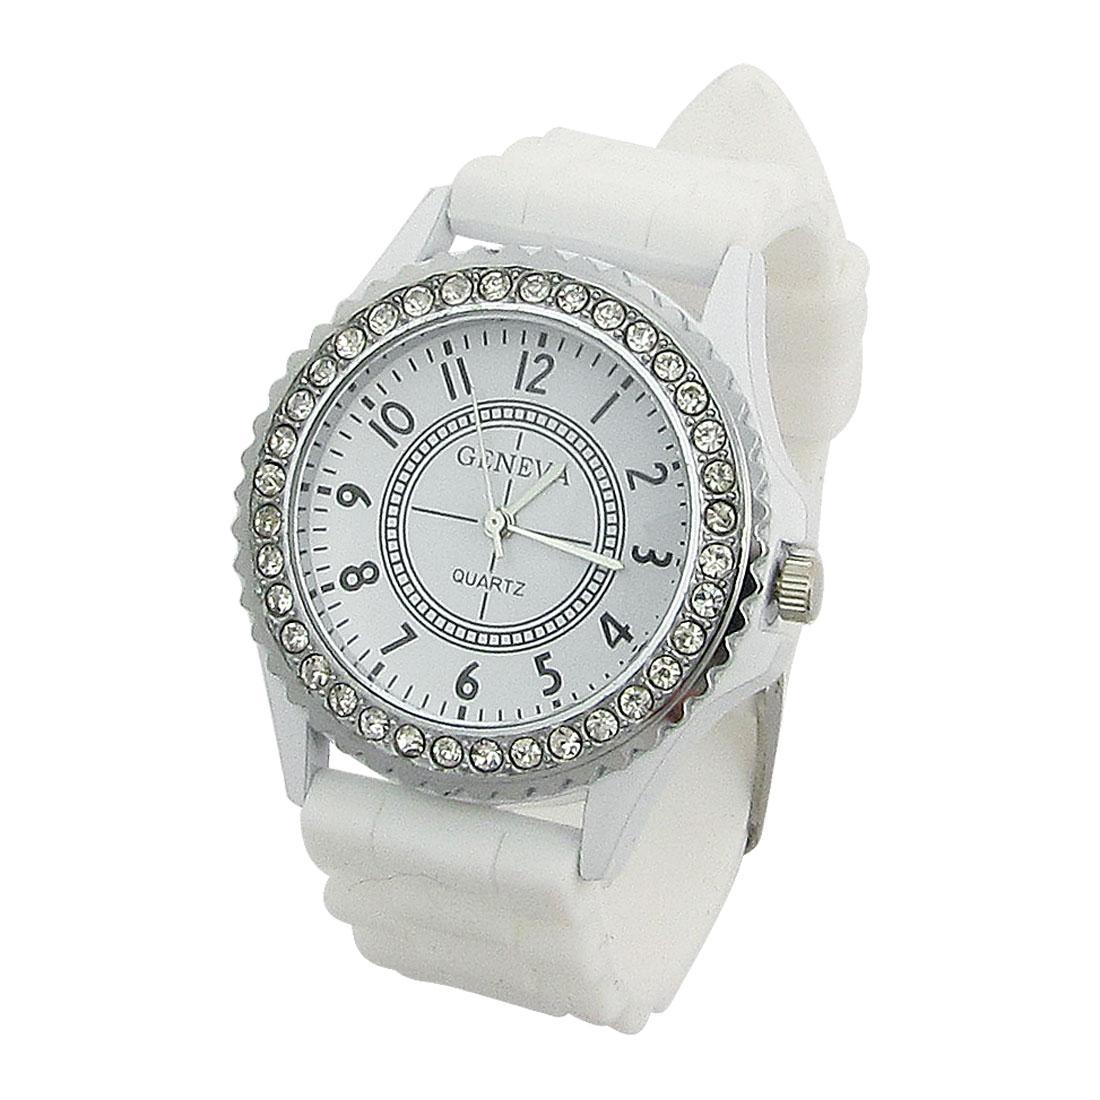 Lady Faux Rhinestone Inlaid Dial Adjustable Band Quartz Watch White